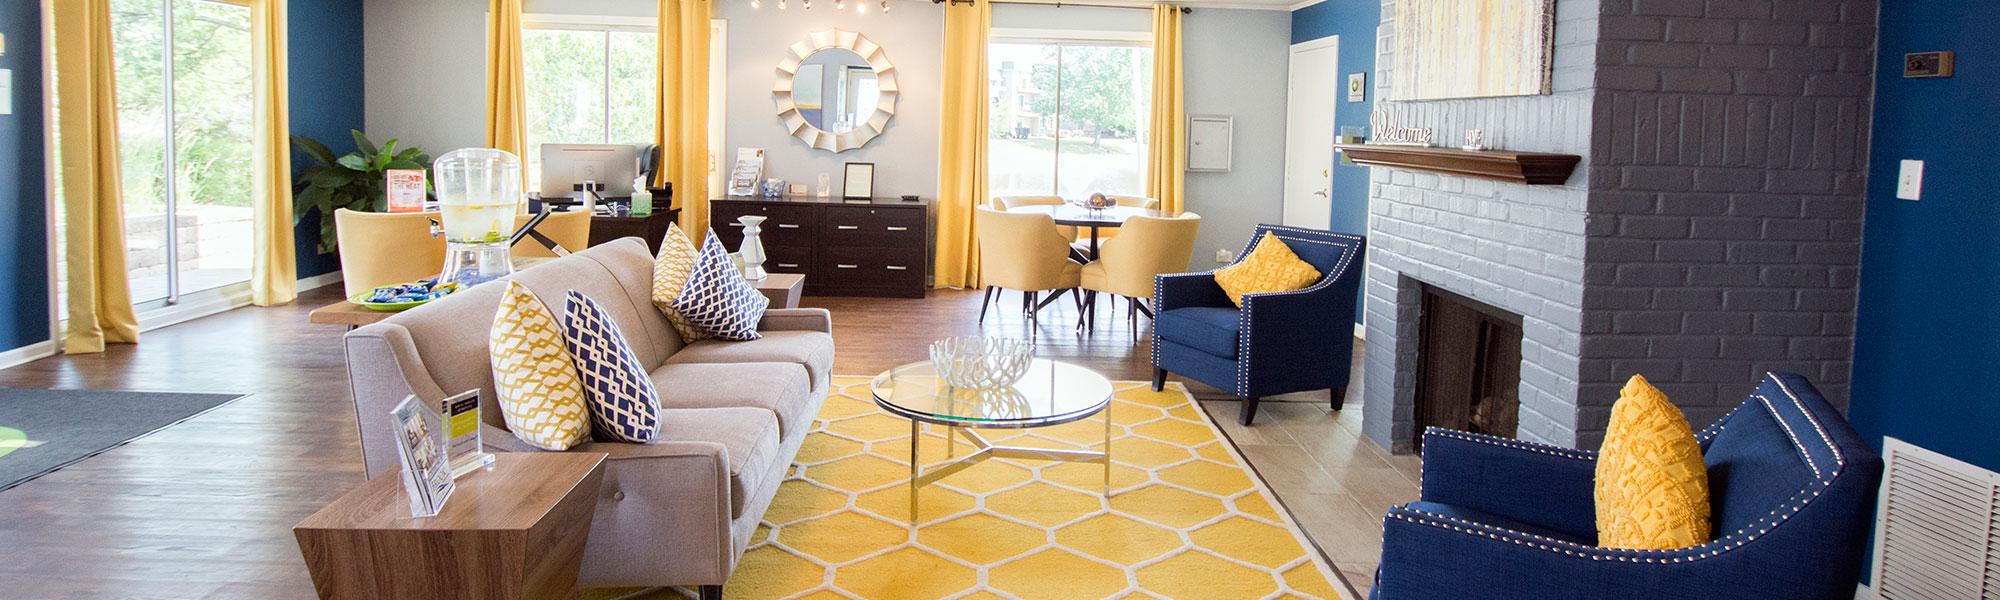 Awesome Fountain Square Apartments Tuscaloosa Images - Design ...